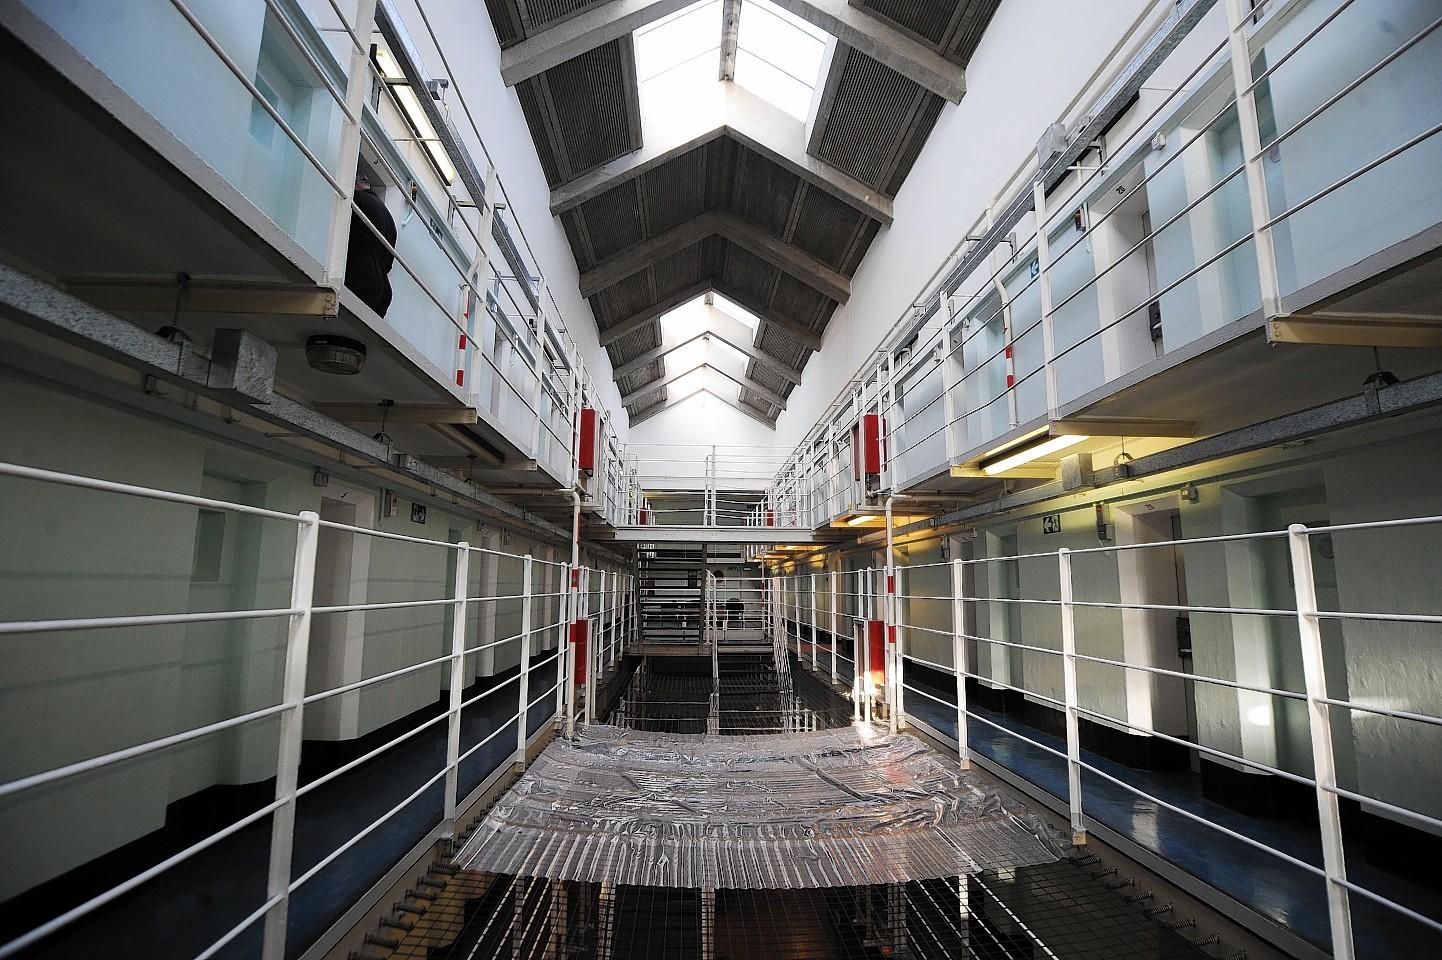 Prison halls in 2009